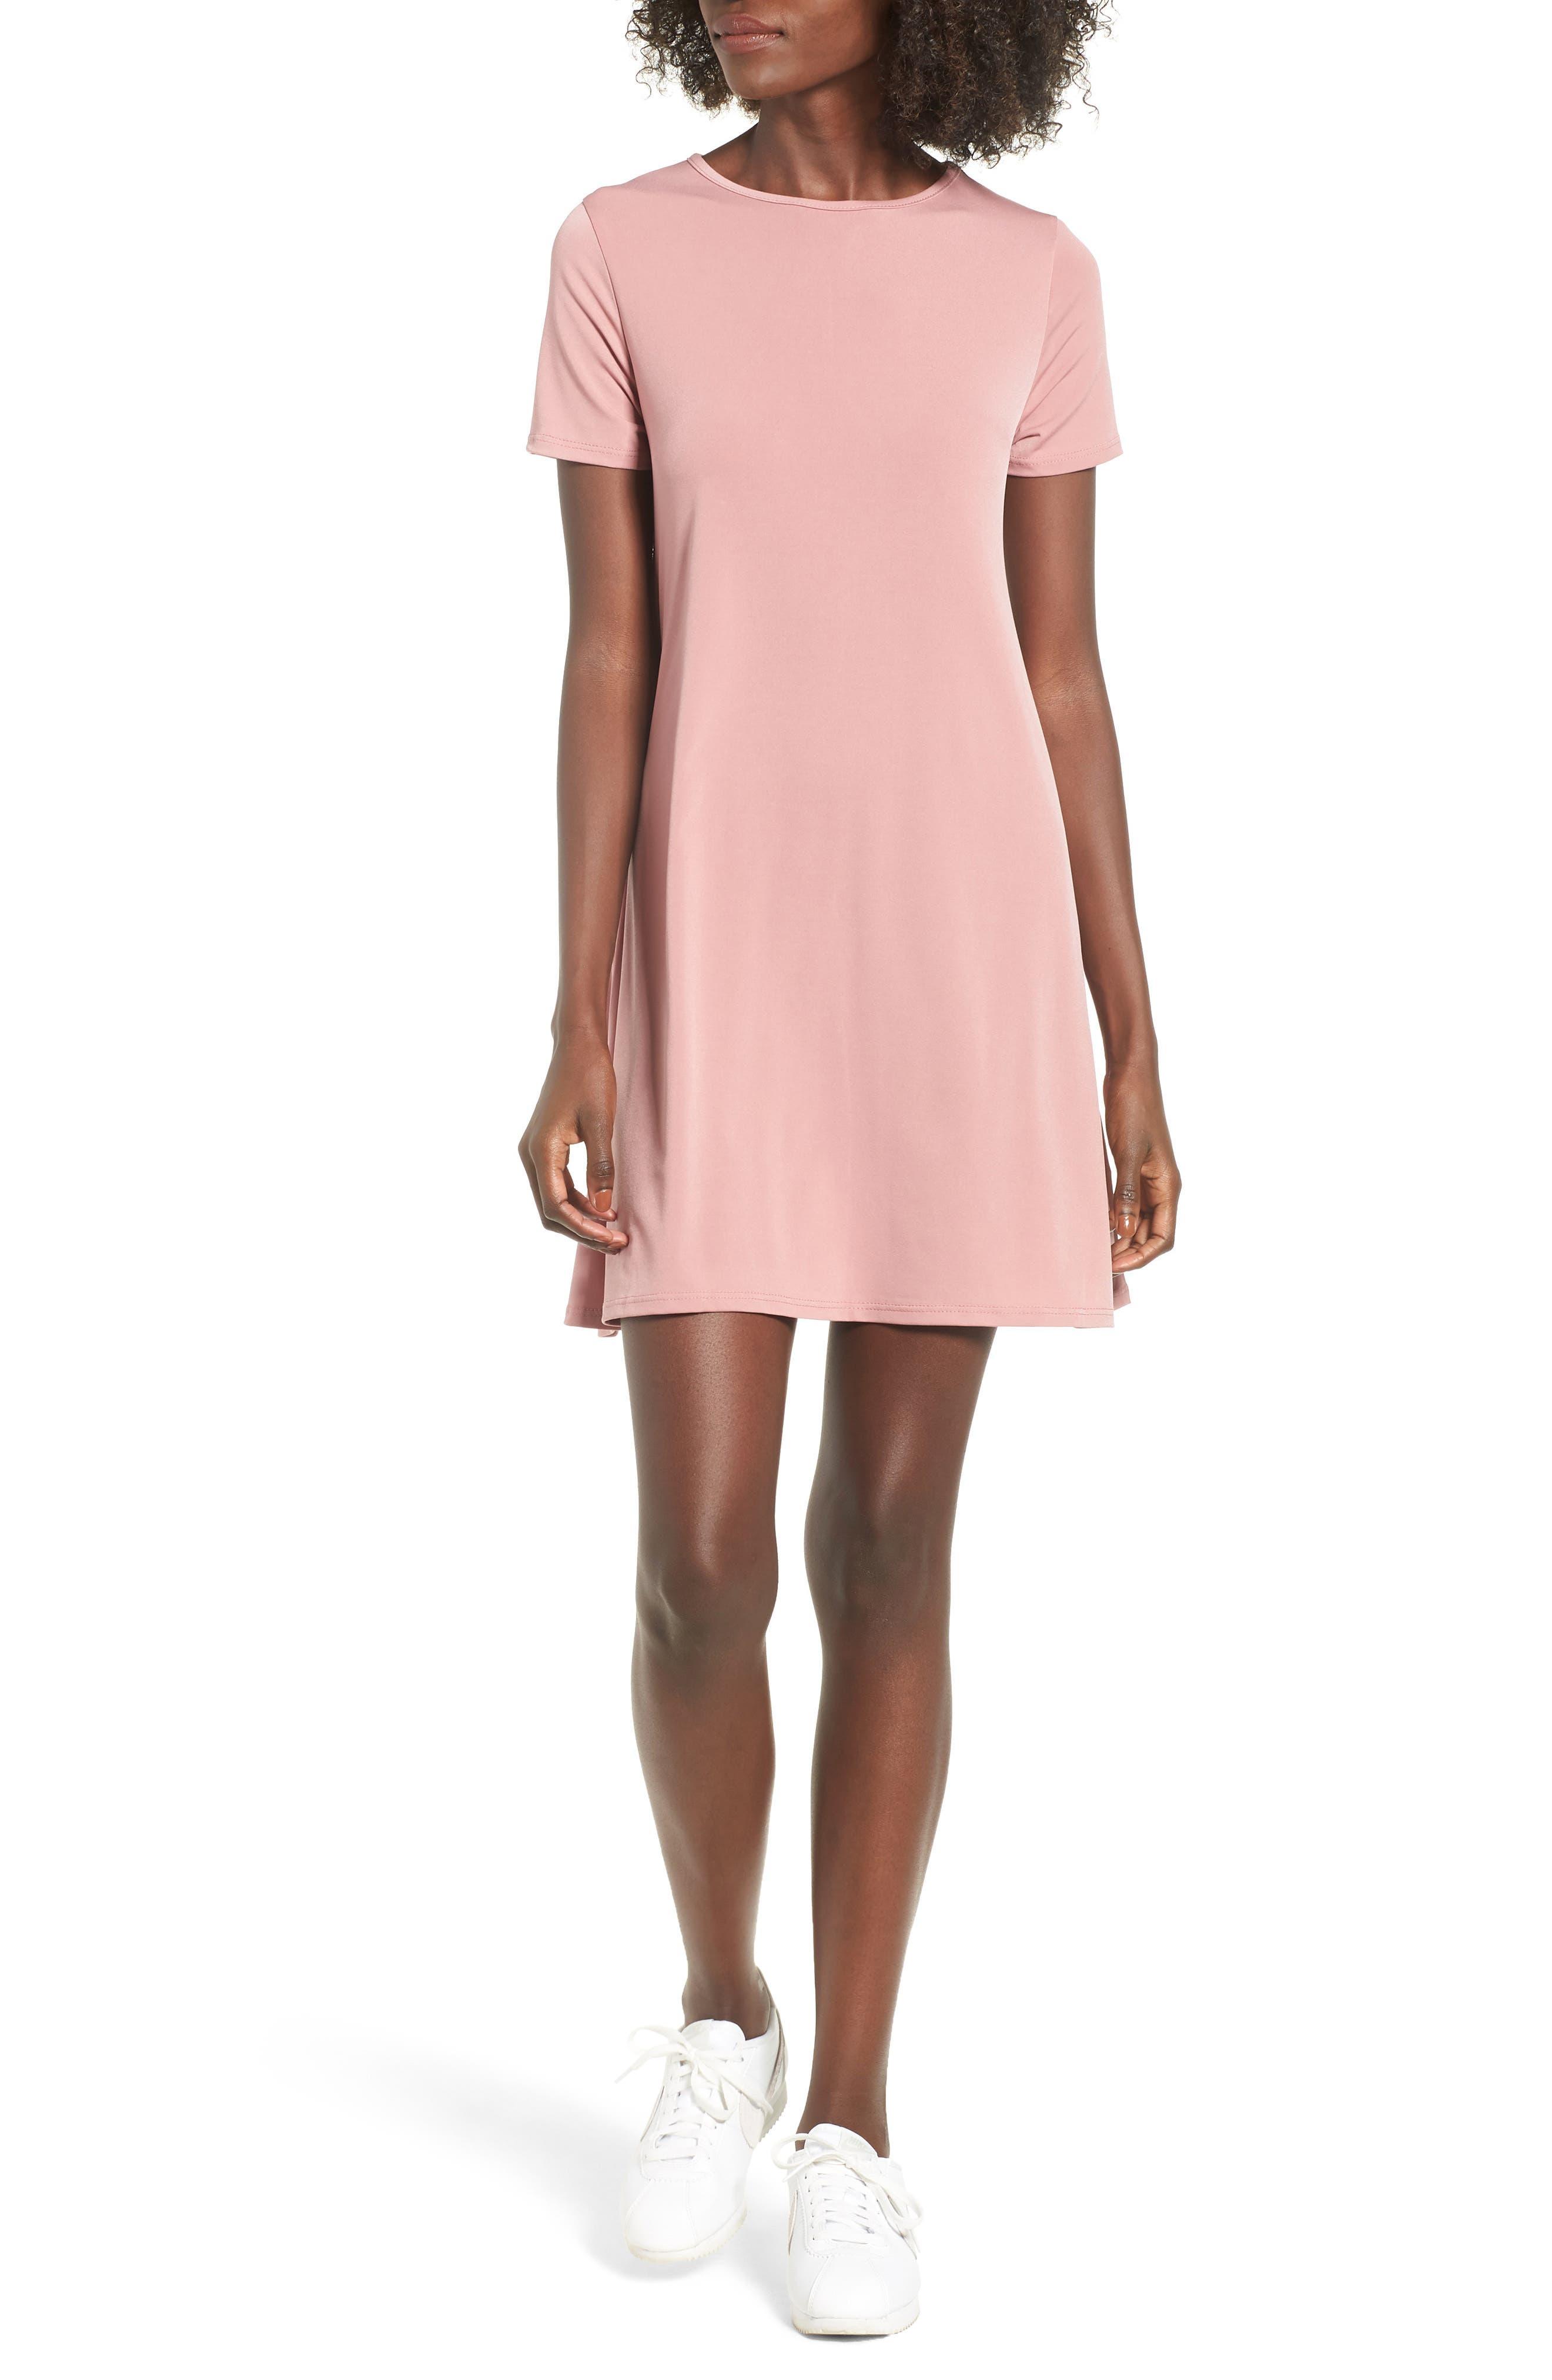 Cotton Emporium Swing T-Shirt Dress